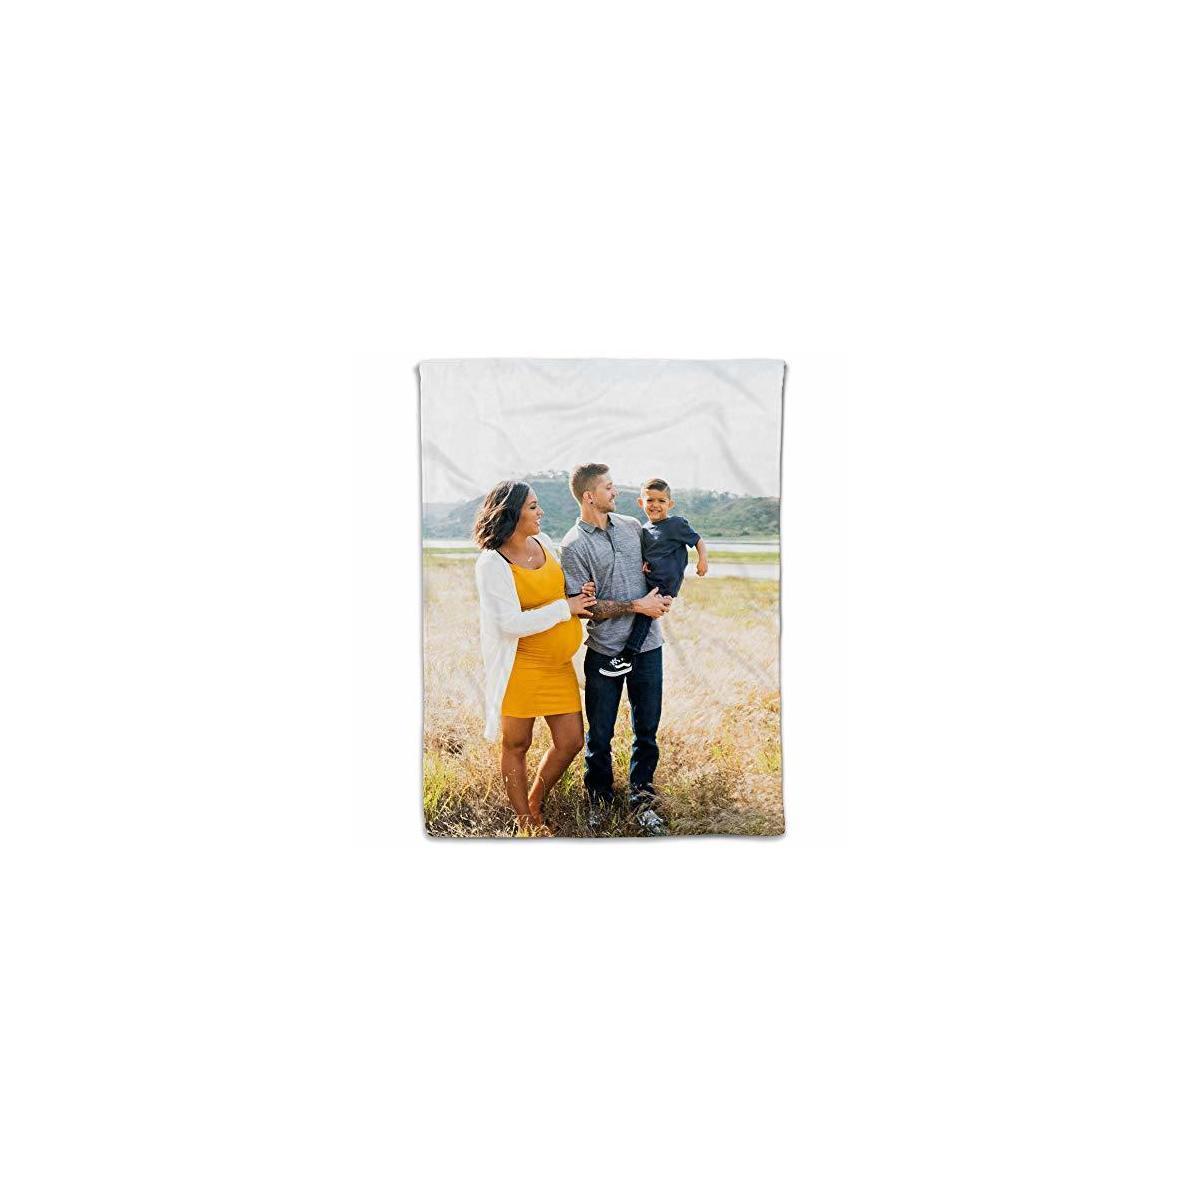 Custom Blanket Upload Photo Blanket Size Small 30